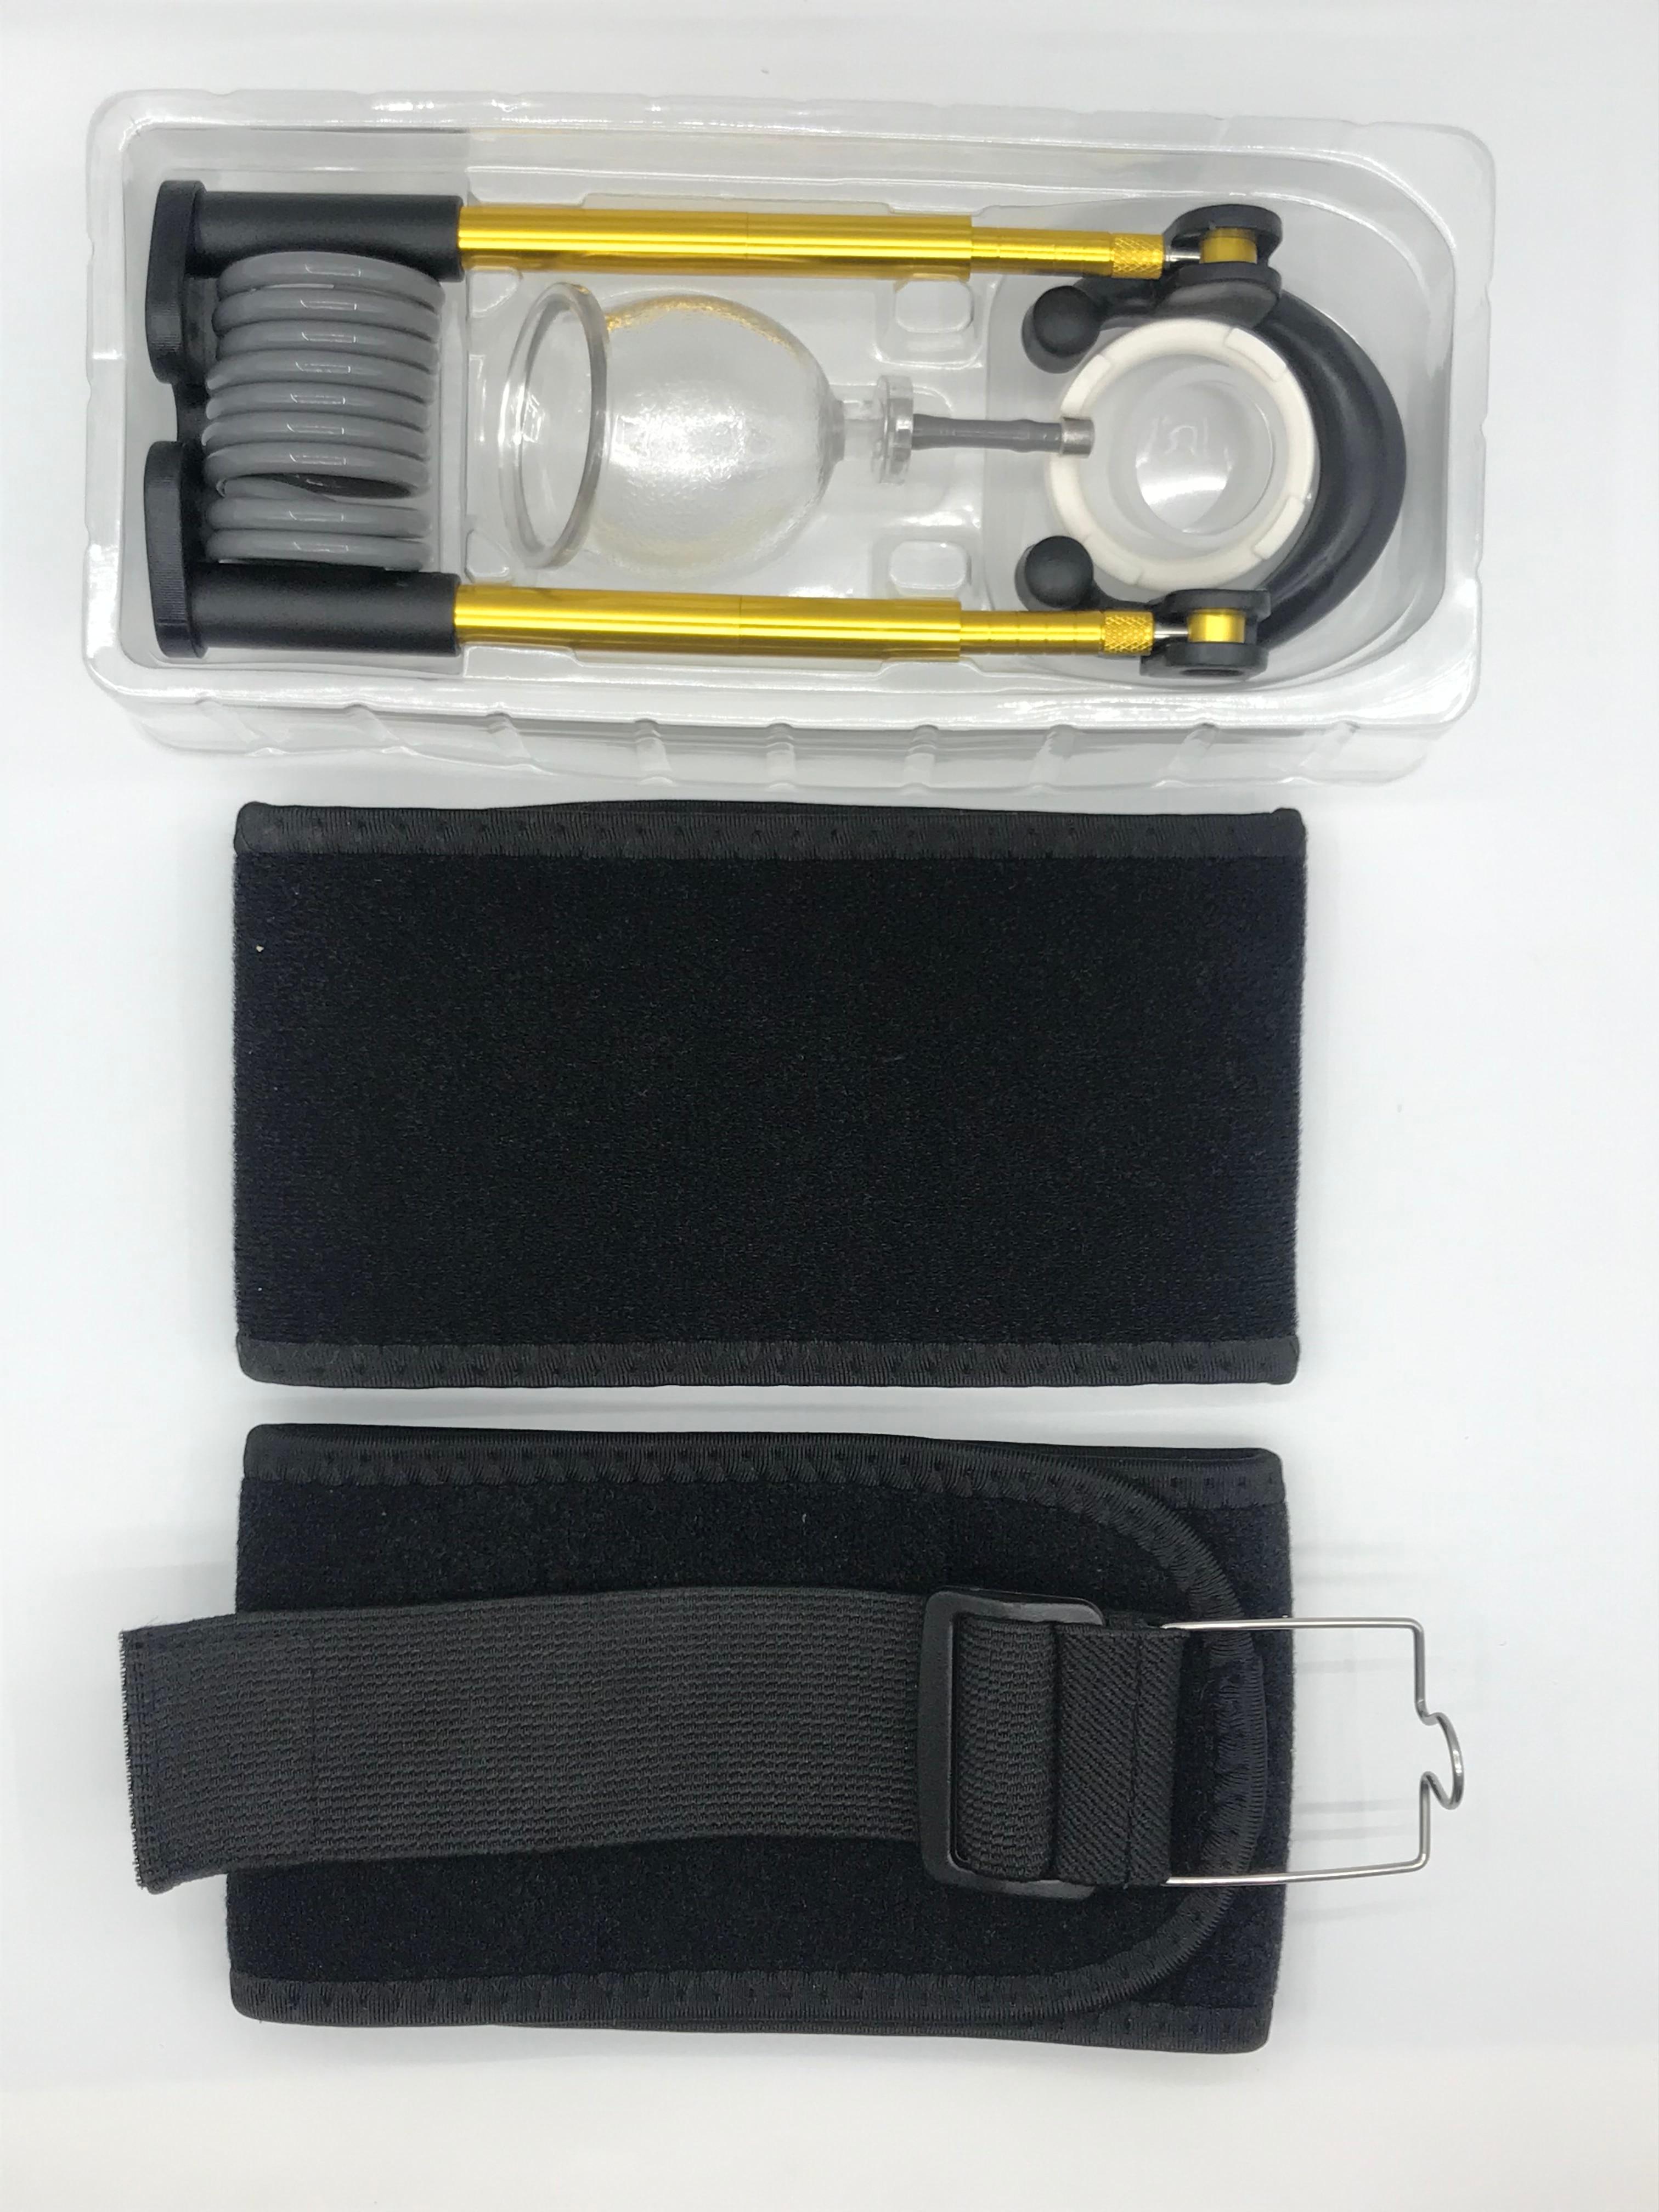 Pro Sistema de Alargamento Sistema Maca Enhancement Ampliador Masculino peni phallosan mestres pro extensor peni bomba